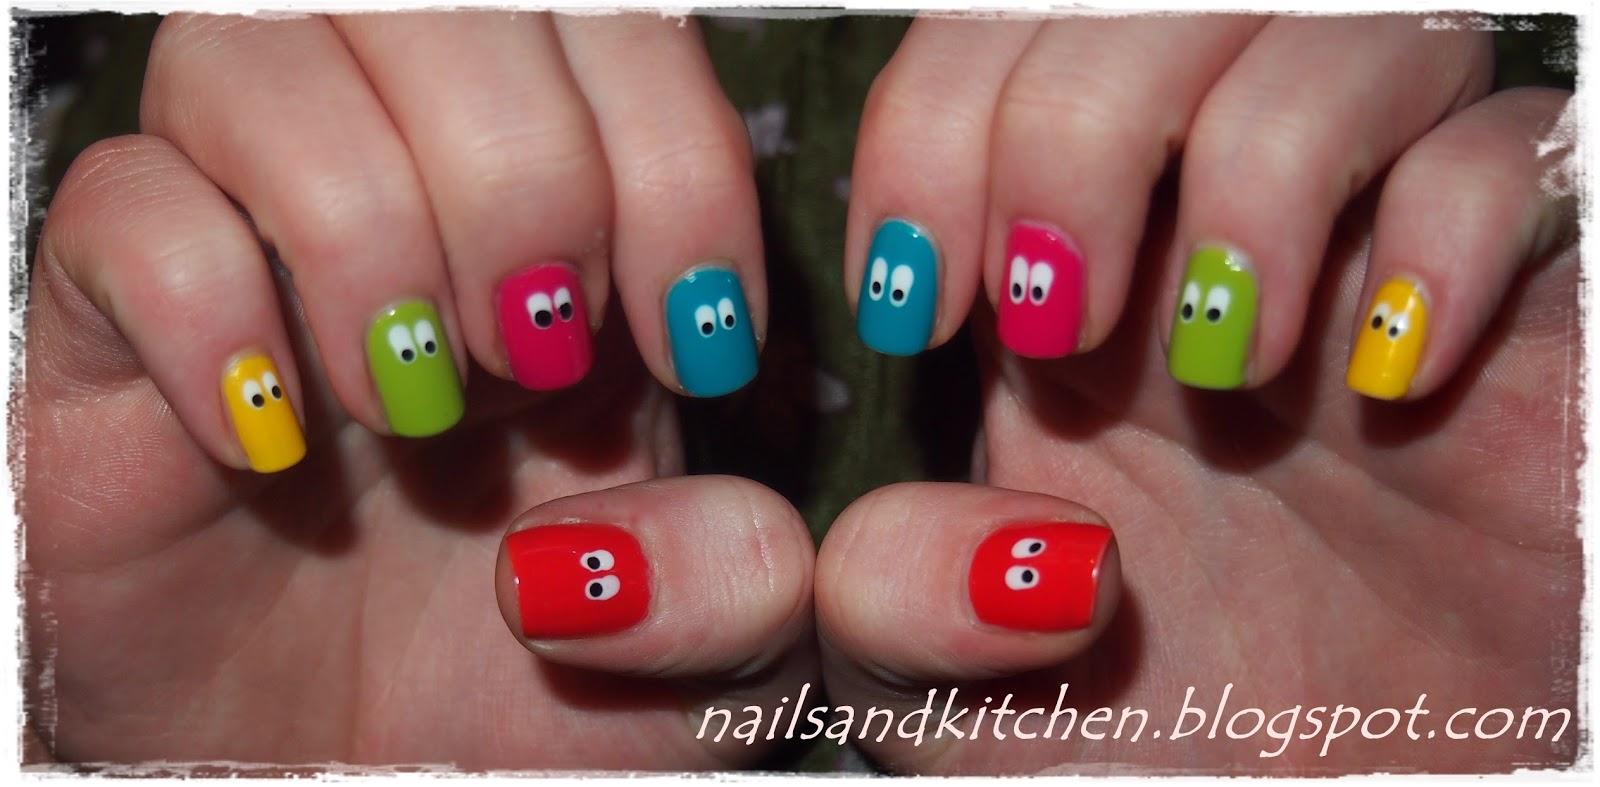 http://nailsandkitchen.blogspot.com/2014/05/skittlesowe-oczy.html